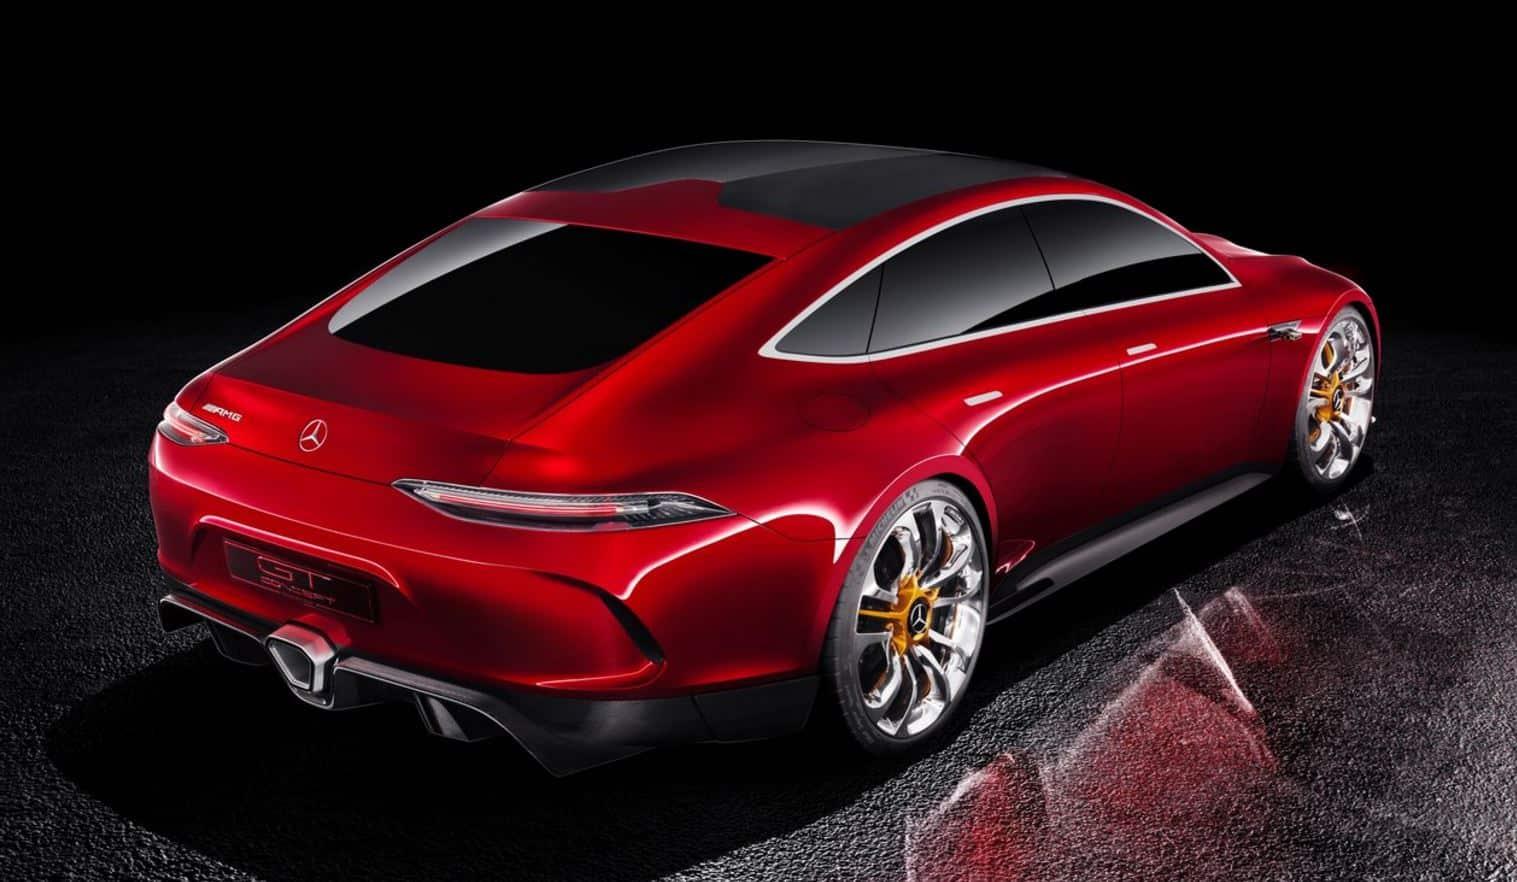 Mercedes Benz AMG GT Concept 12